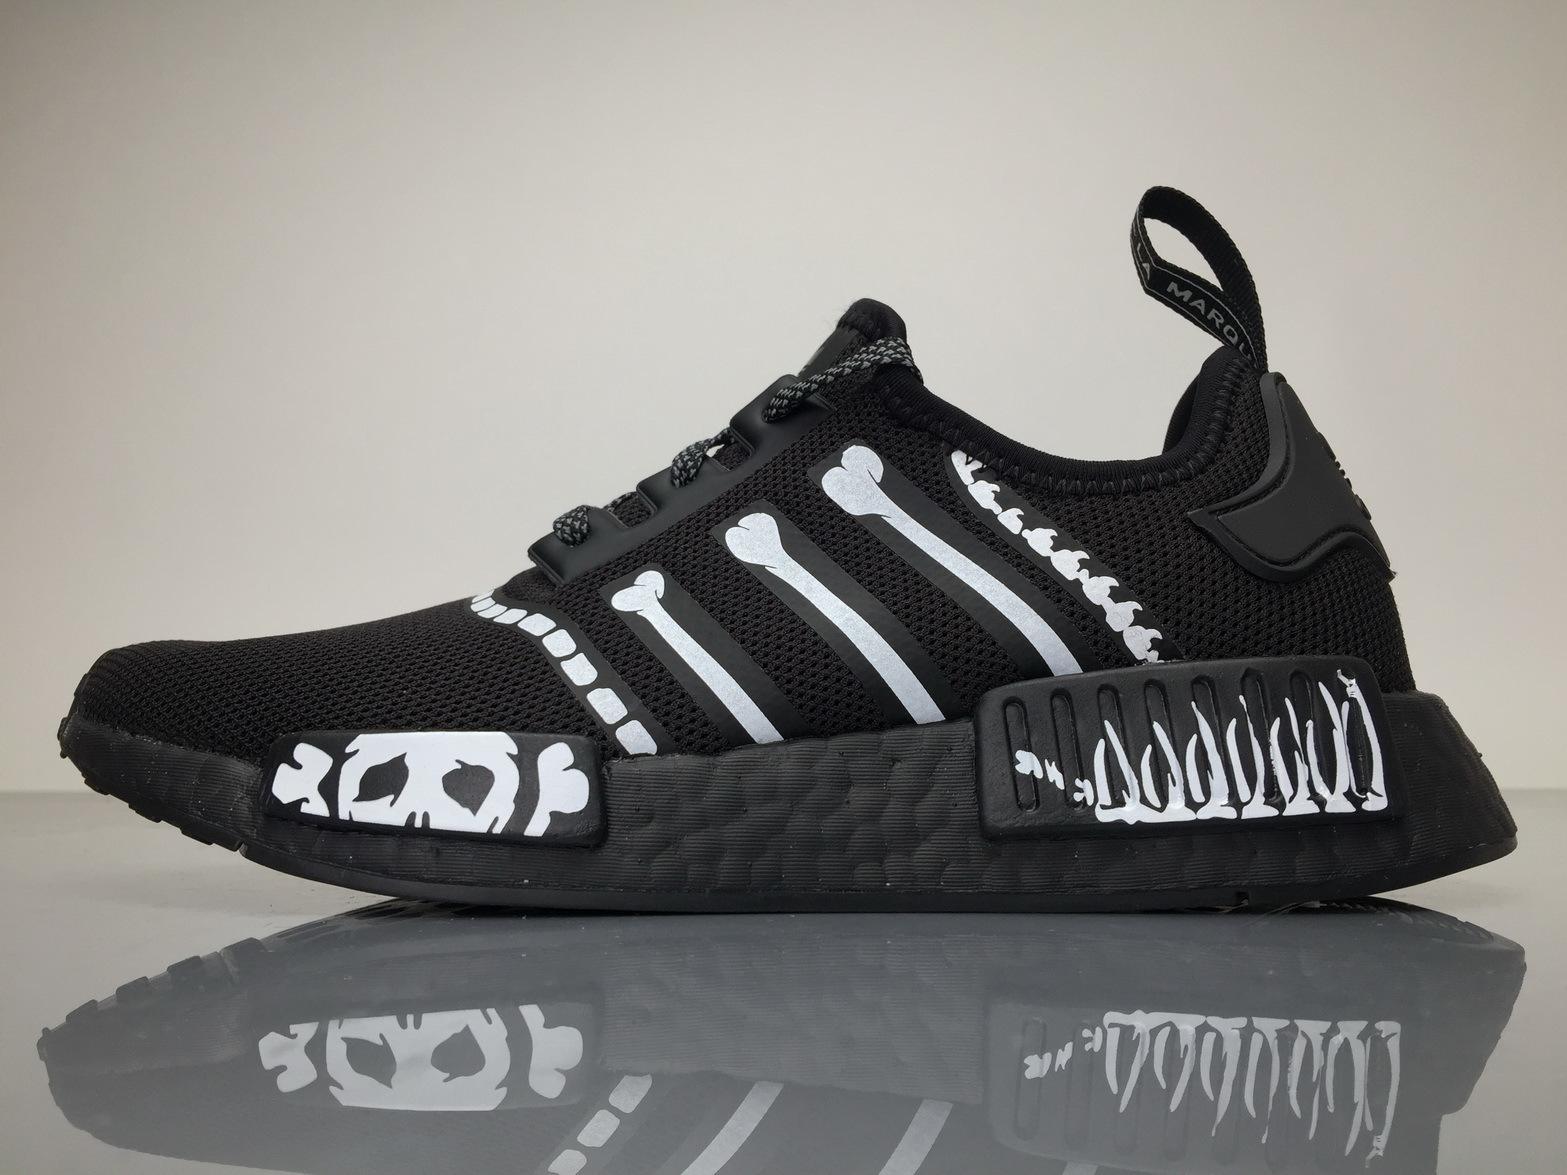 6eabd489e Adidas Nmd R1 Custom Mastermind and 50 similar items. 0